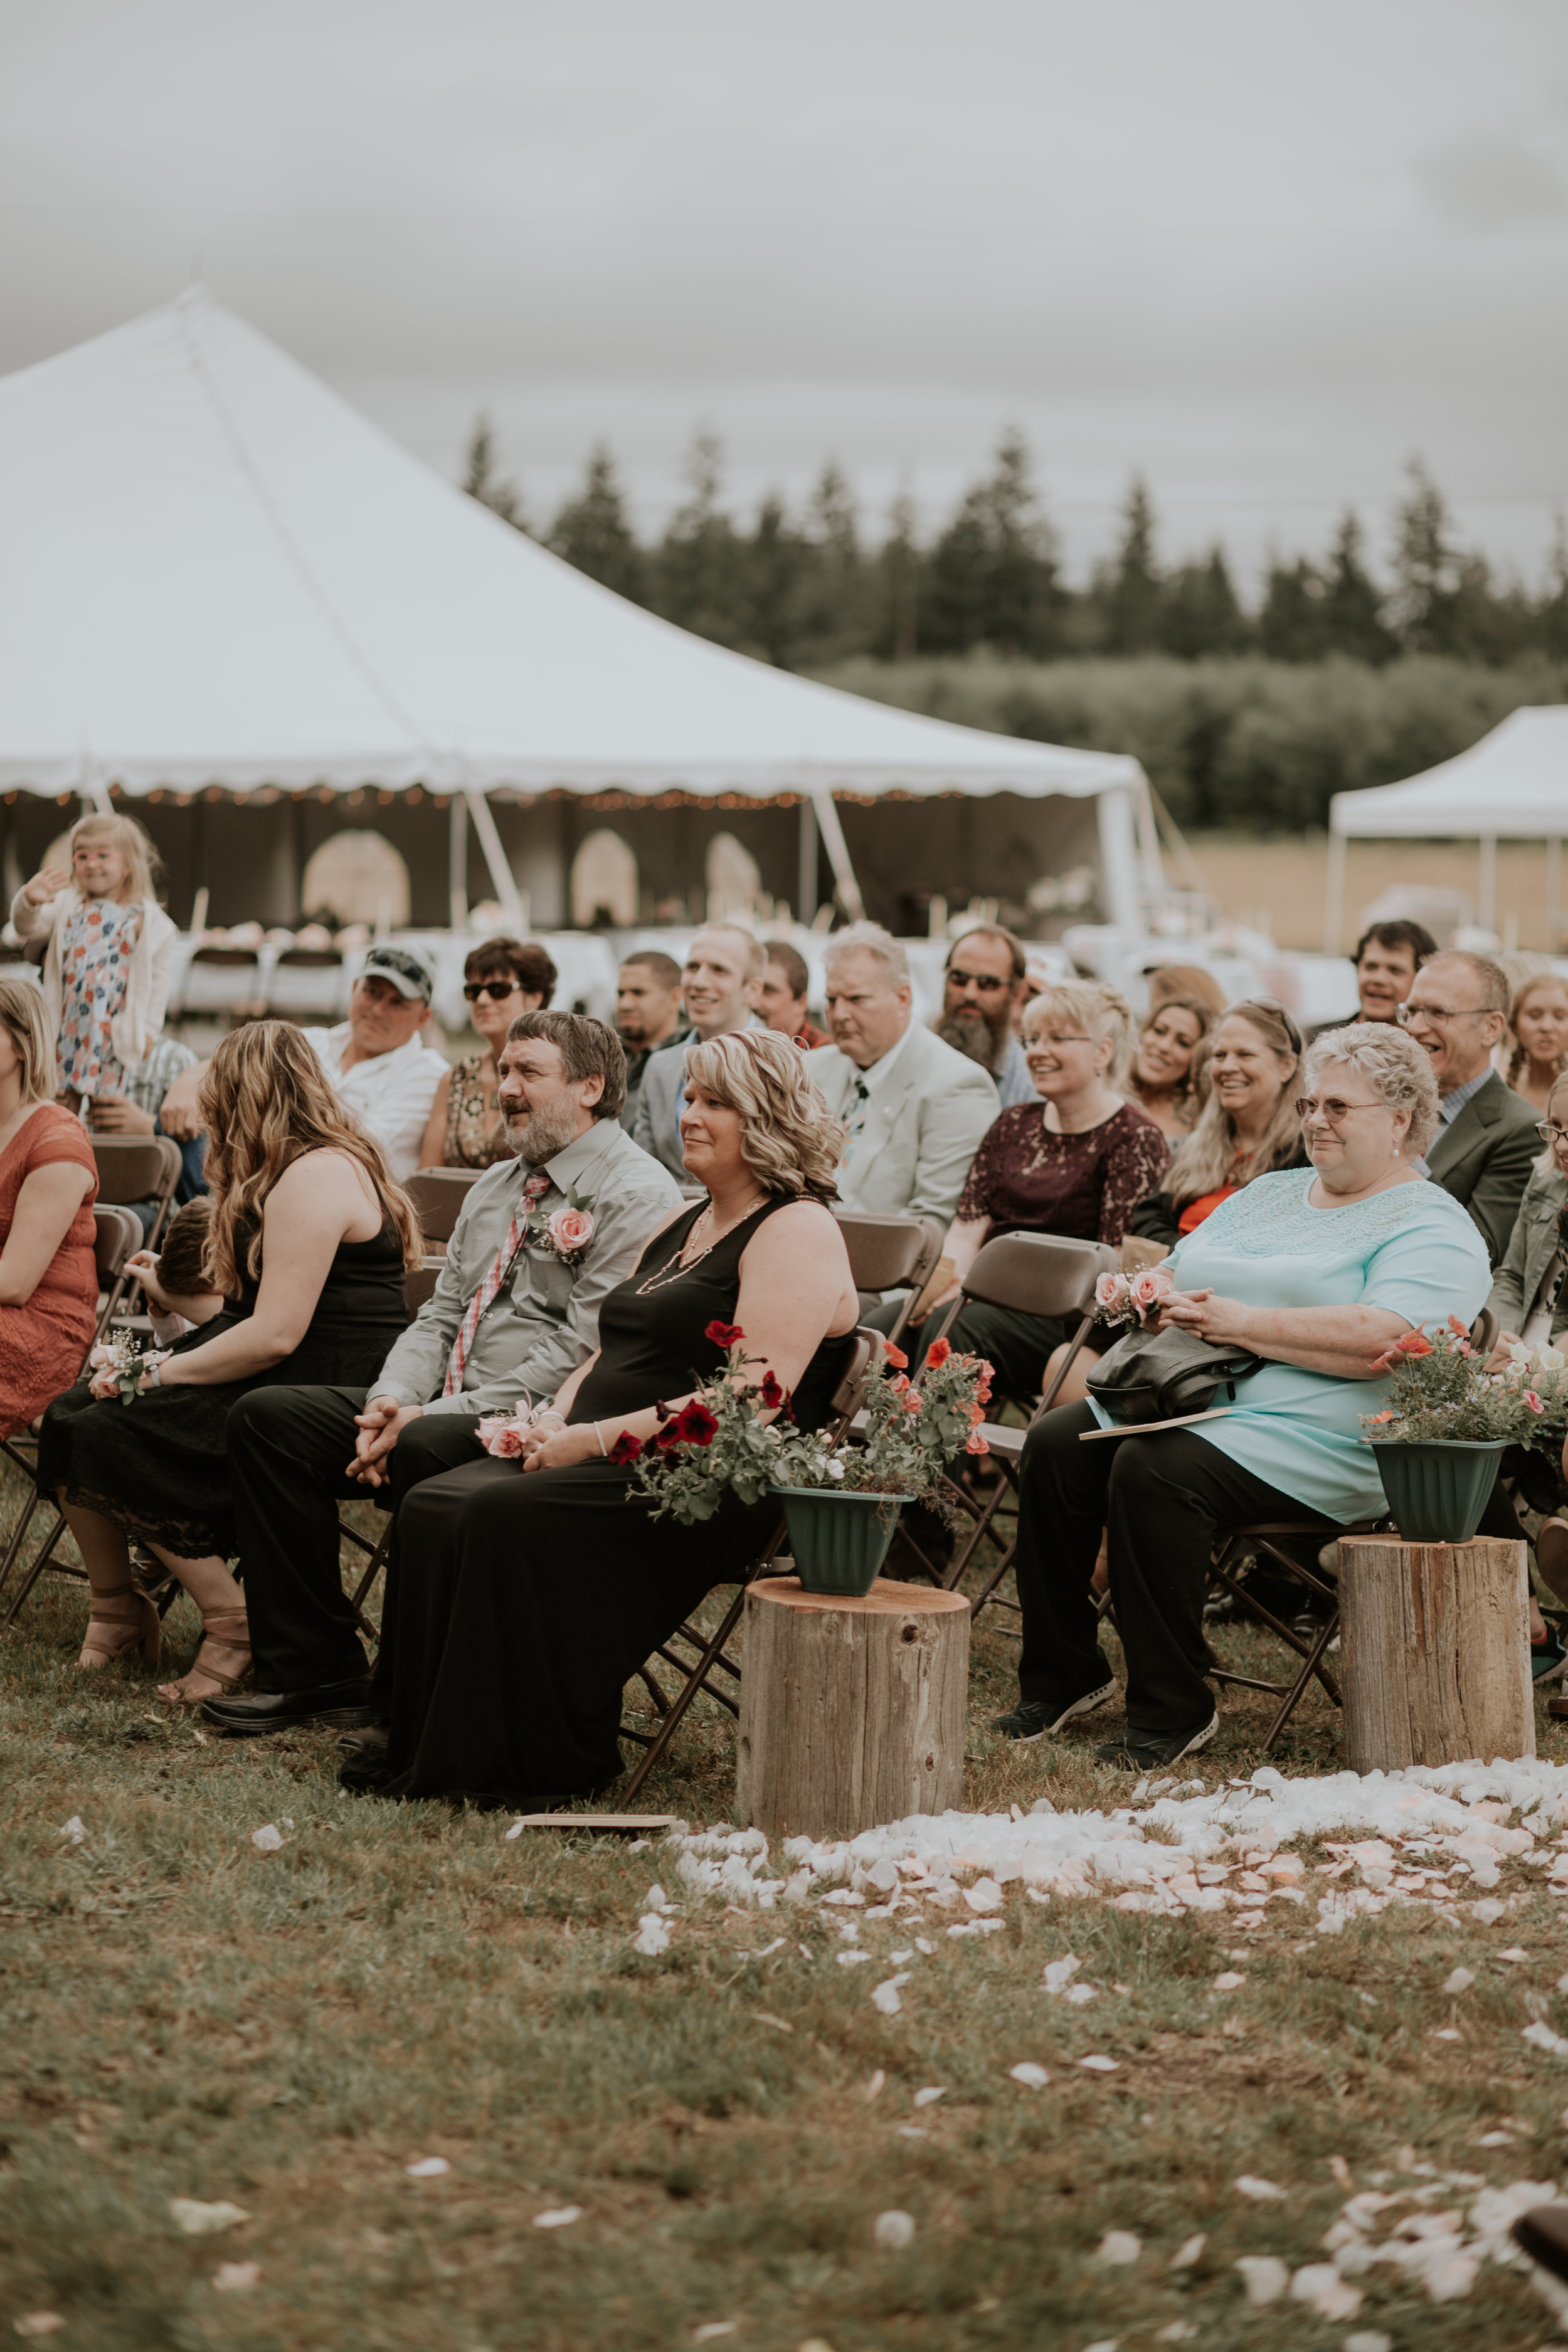 Olympic-Peninsula-Wedding-Photographer-PNW-Forks-Port-Angeles-Kayla-Dawn-Photography-engagement-Olympic-National-Park-46.jpg